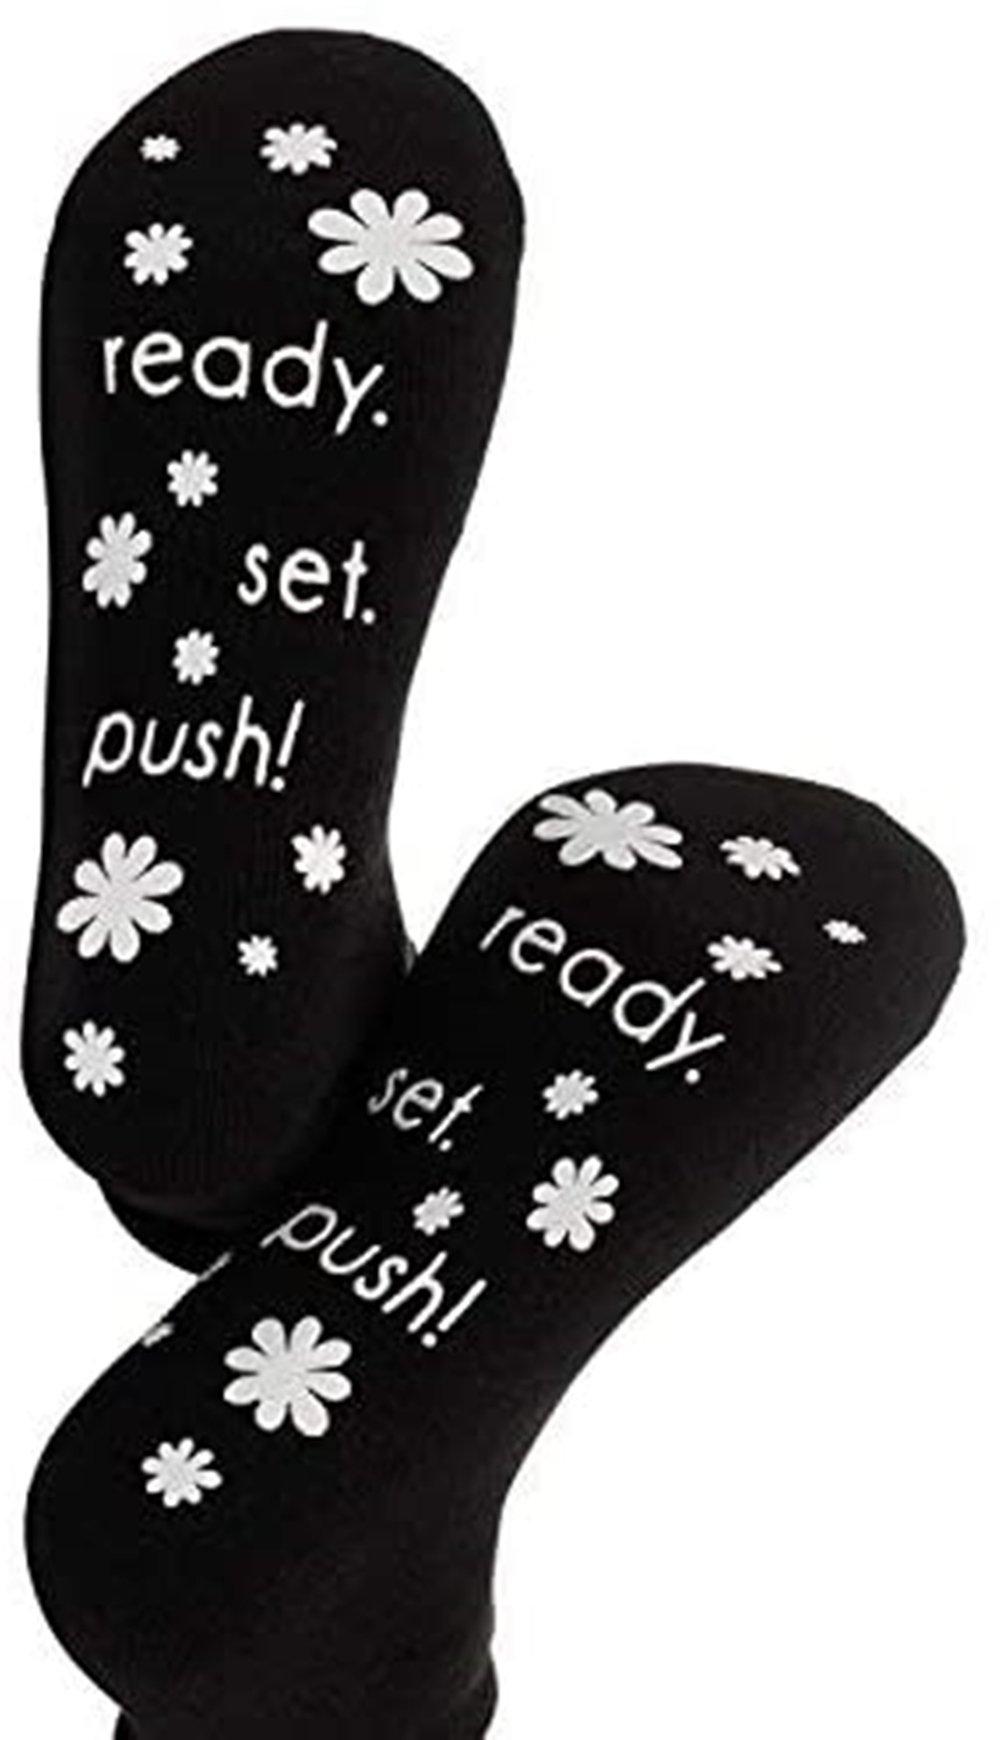 Labor and Delivery Non Slip Socks for Women Inspiration Hospital Funny Socks for Maternity Pregnancy